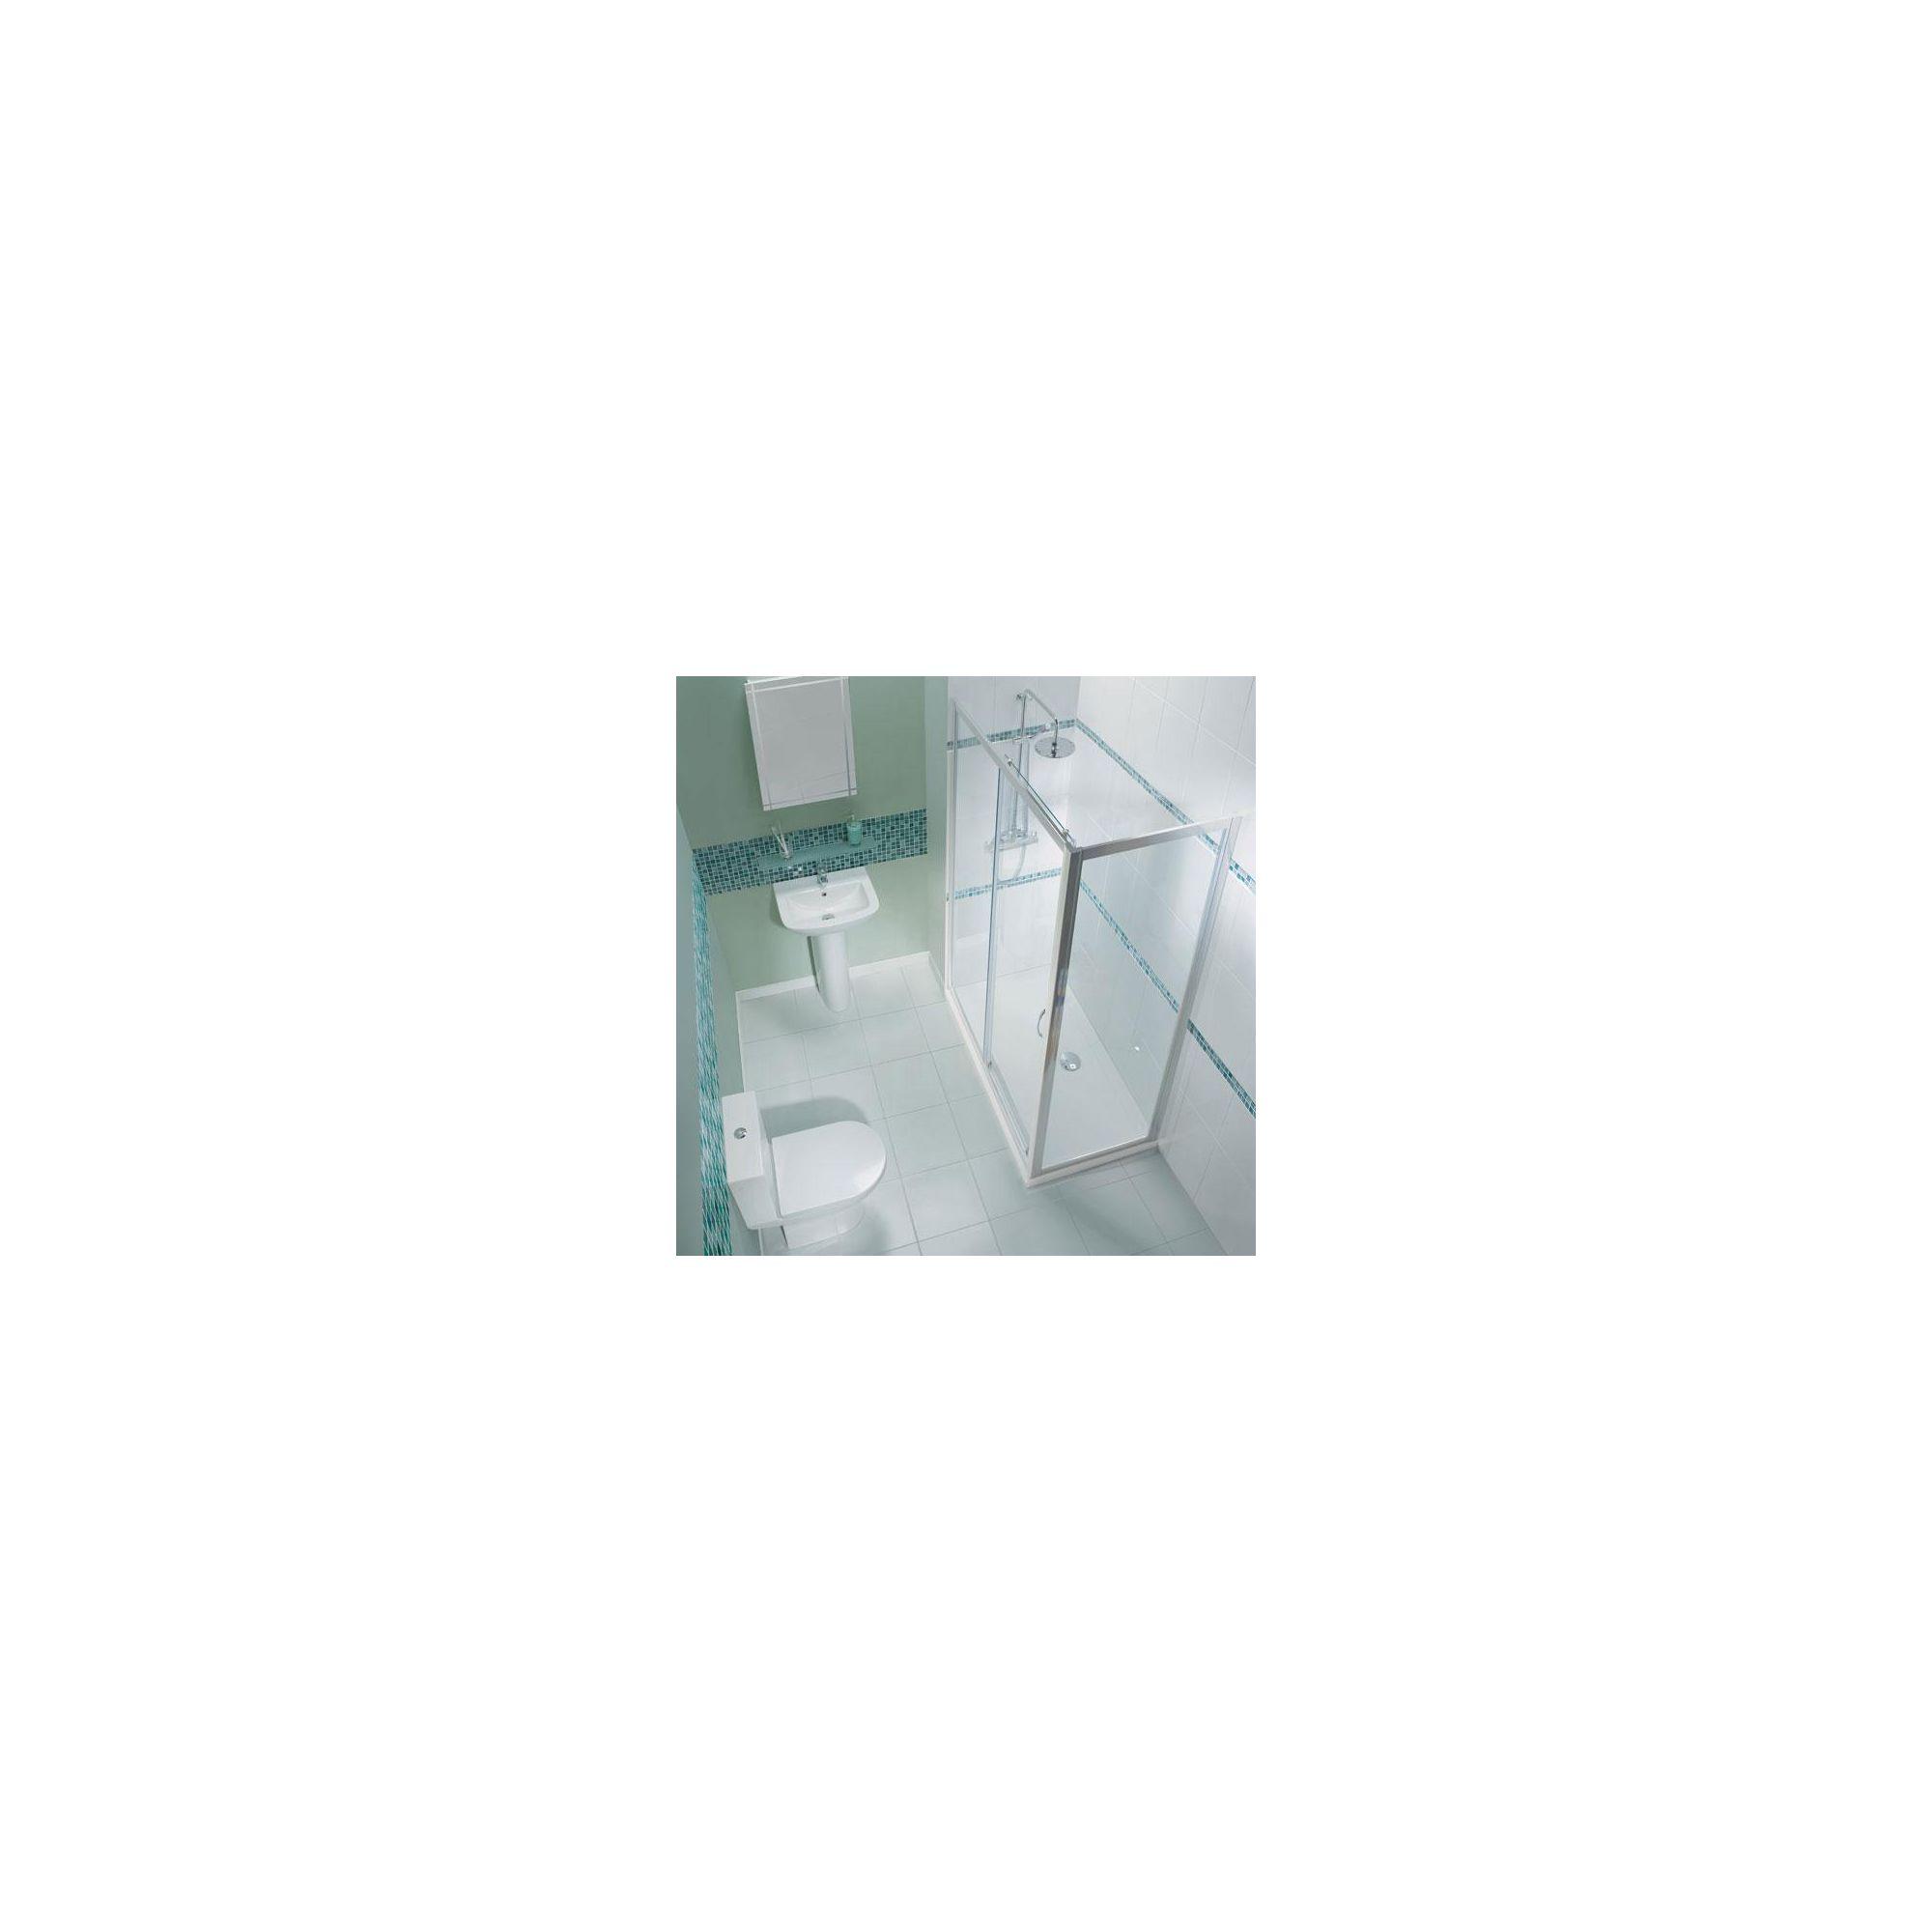 Balterley Framed Sliding Shower Door, 1700mm Wide, 6mm Glass at Tesco Direct